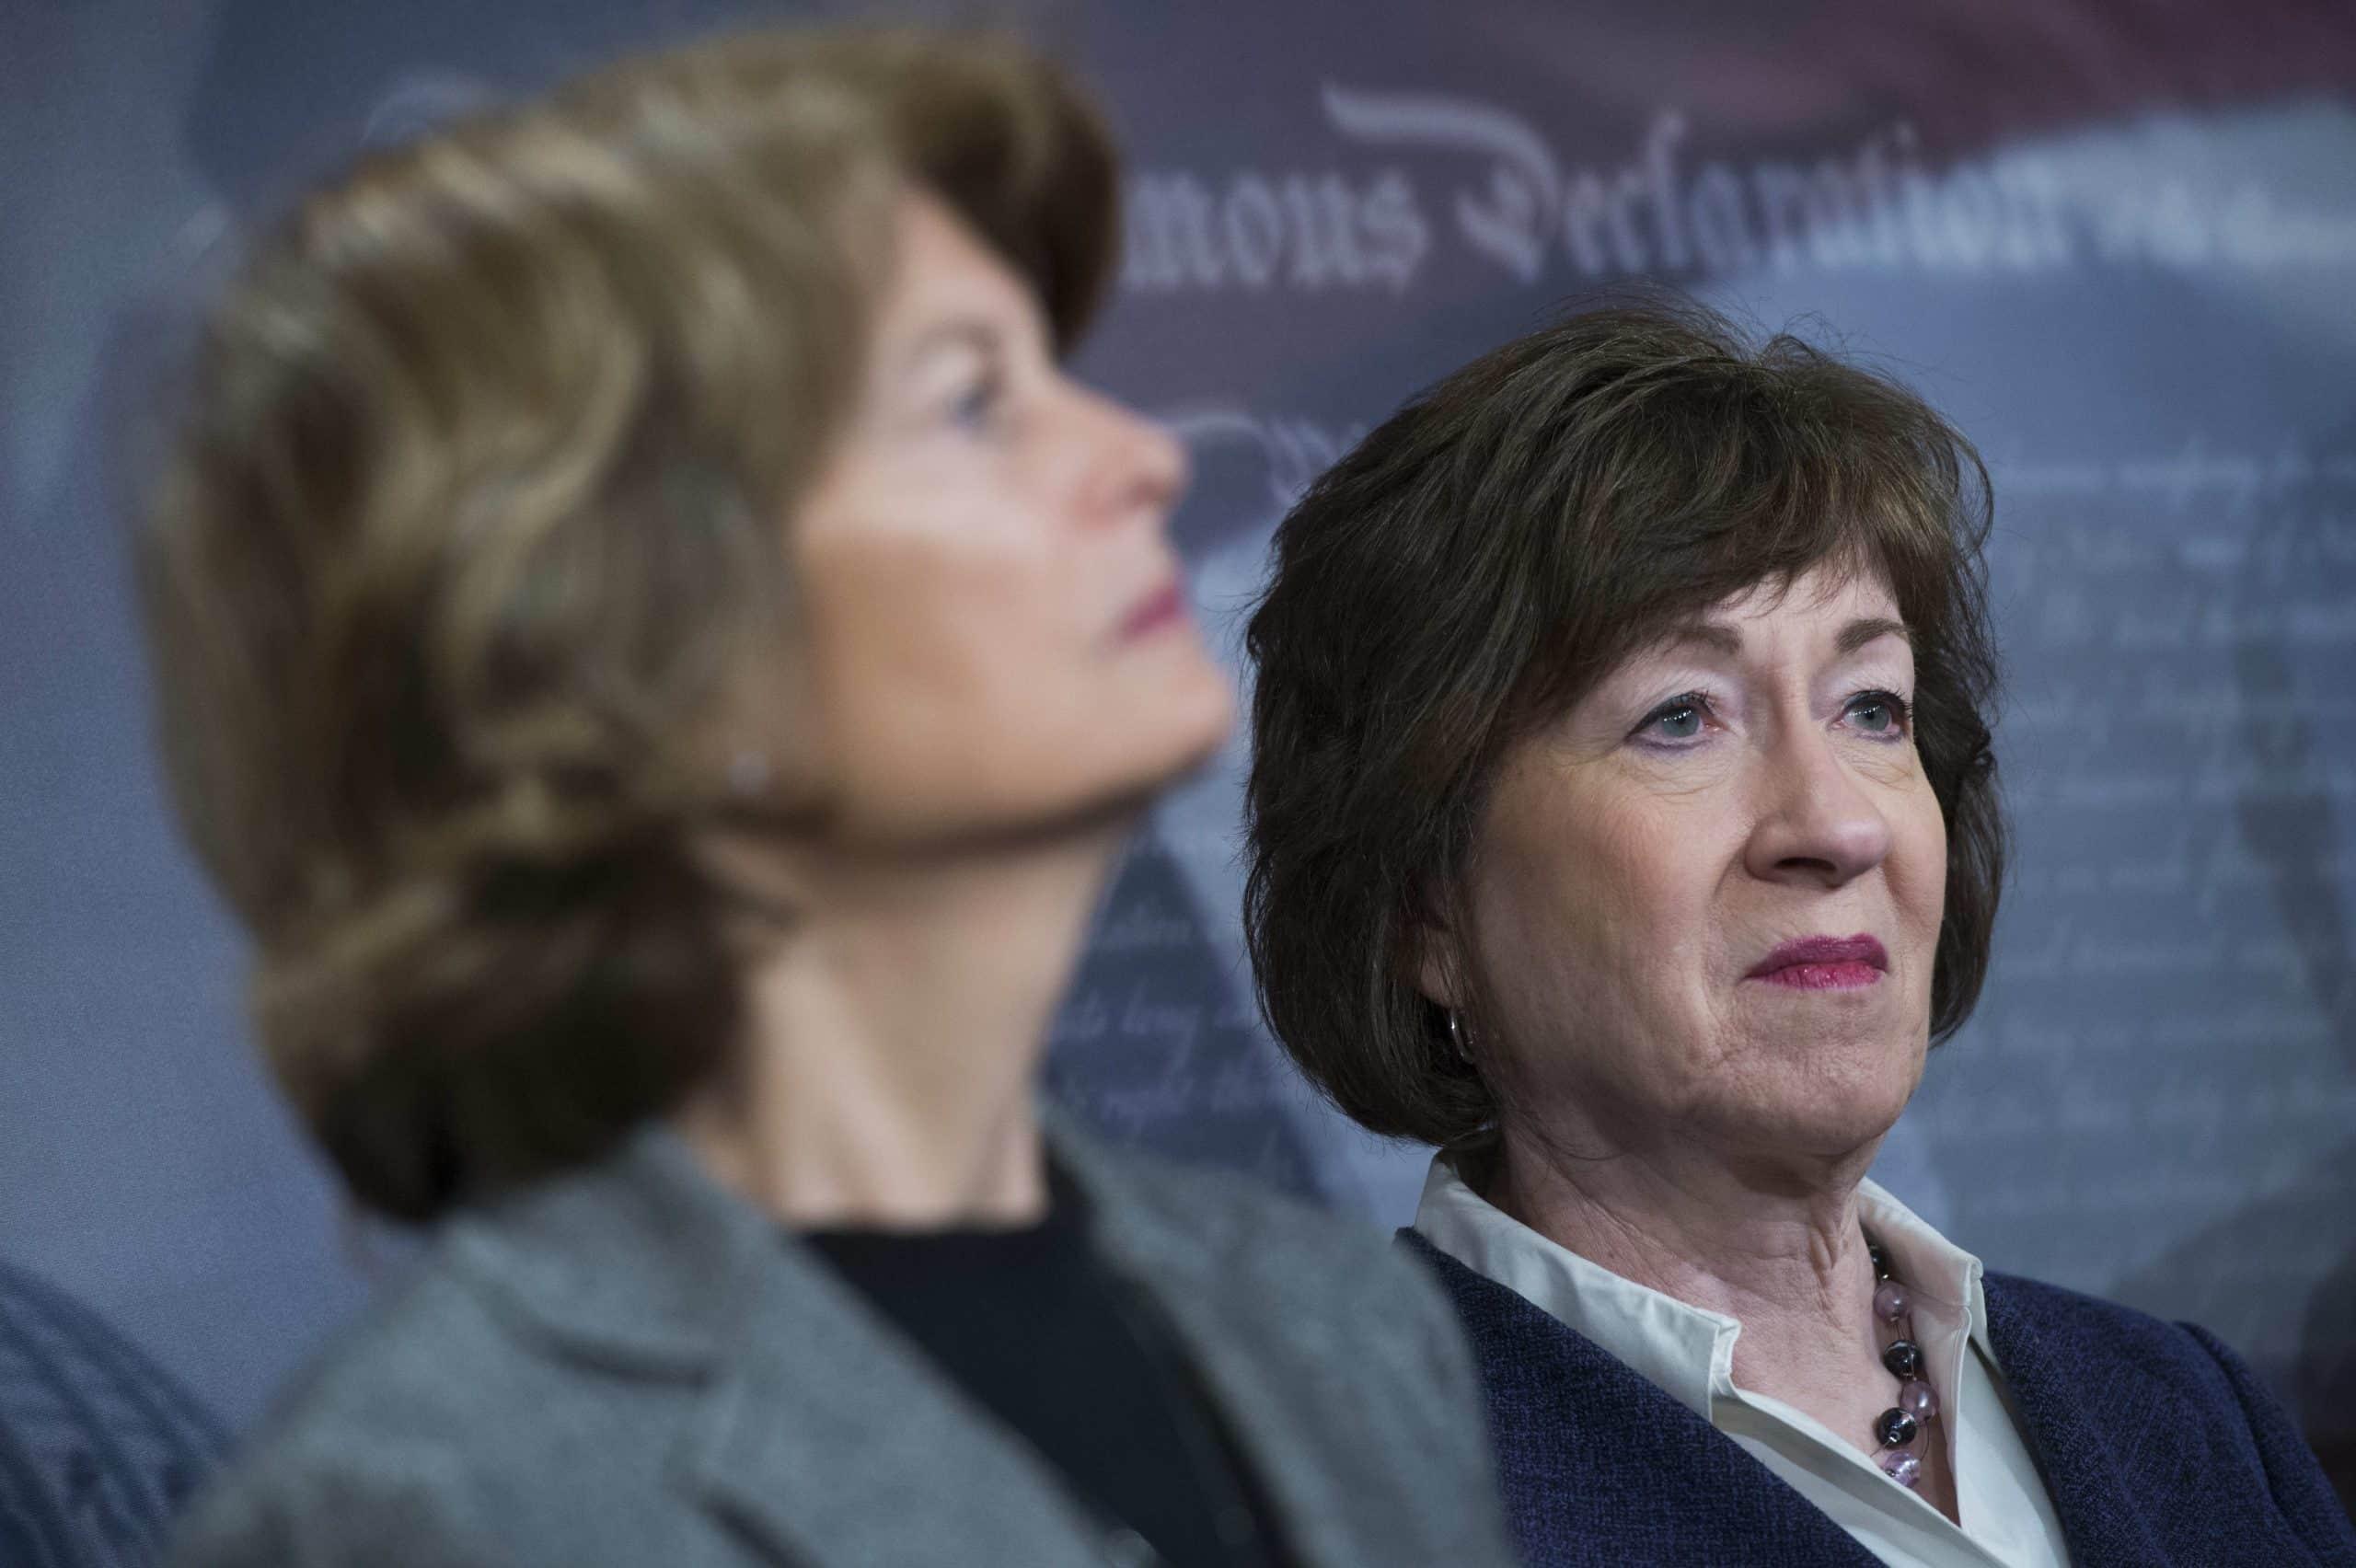 These GOP senators could break the stalemate in Trump's impeachment trial